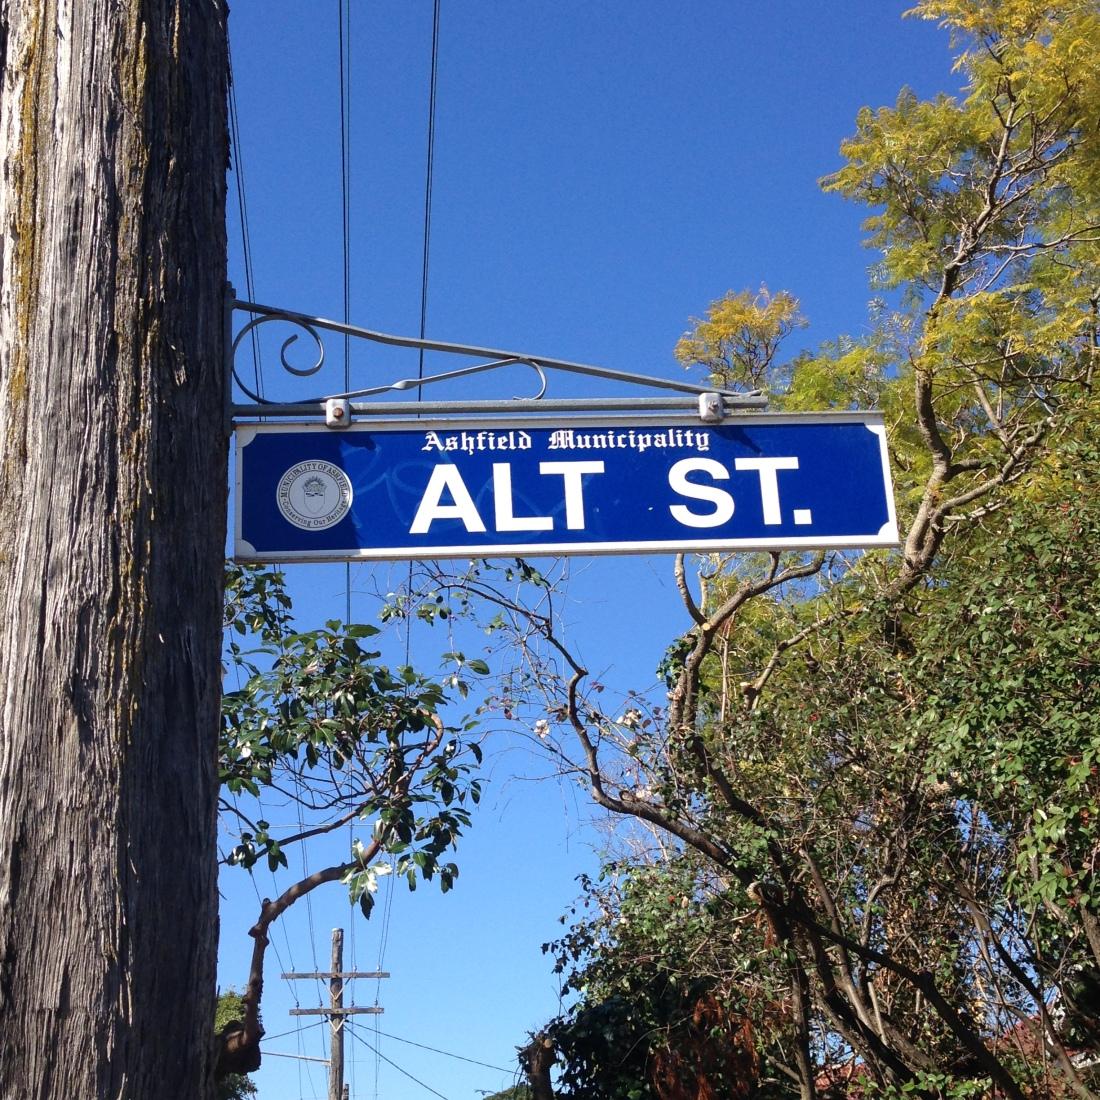 alt-st-sign-haberfield